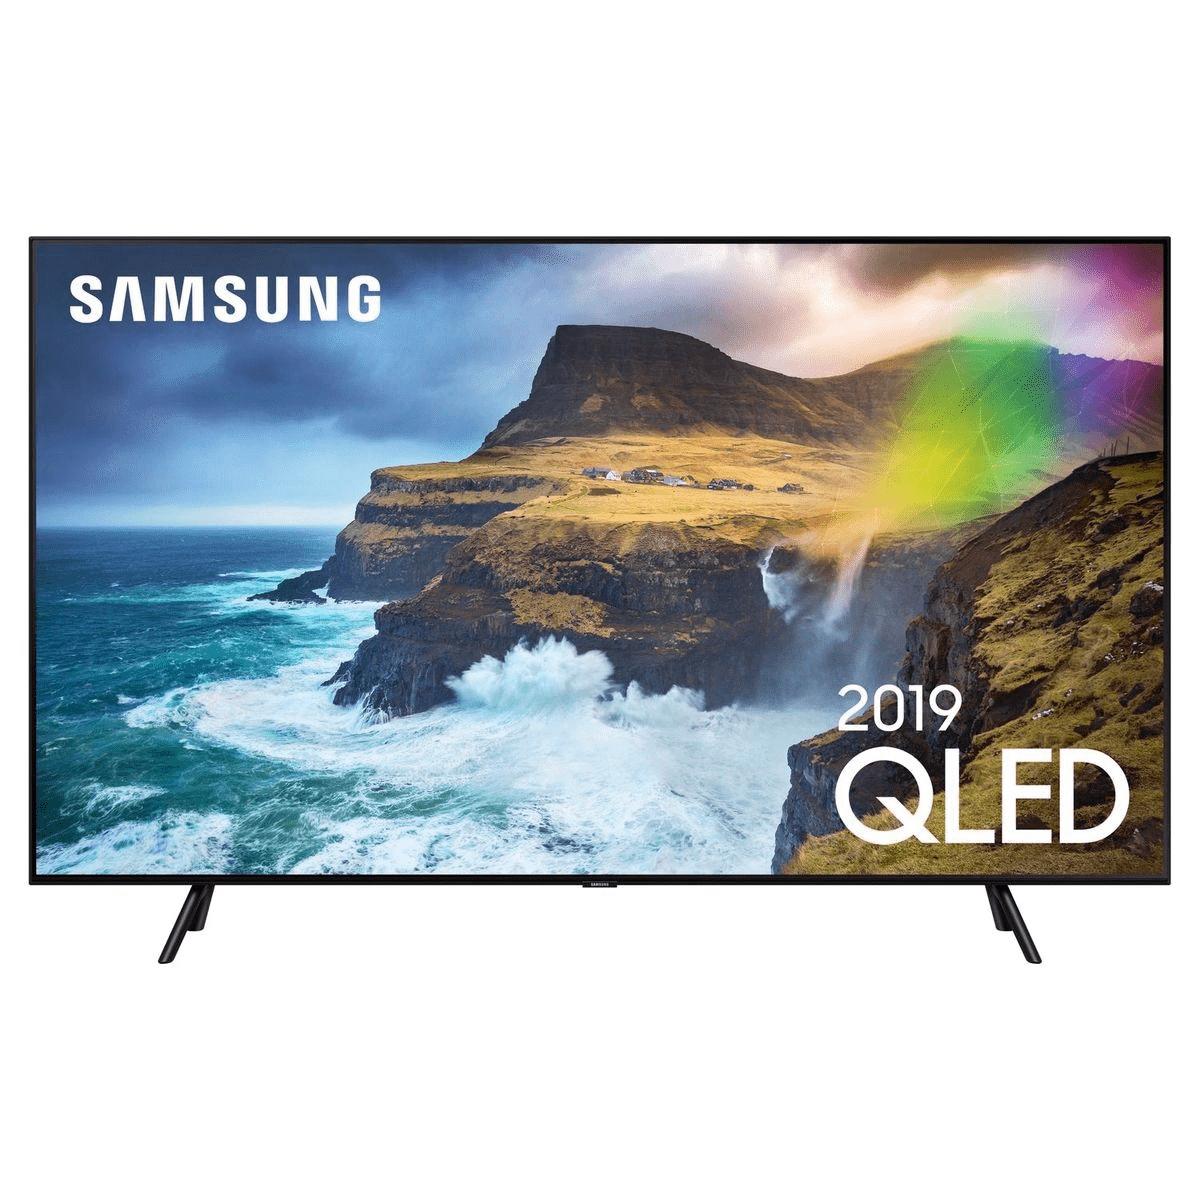 "TV 65"" Samsung QE65Q70R - QLED, 4K UHD"